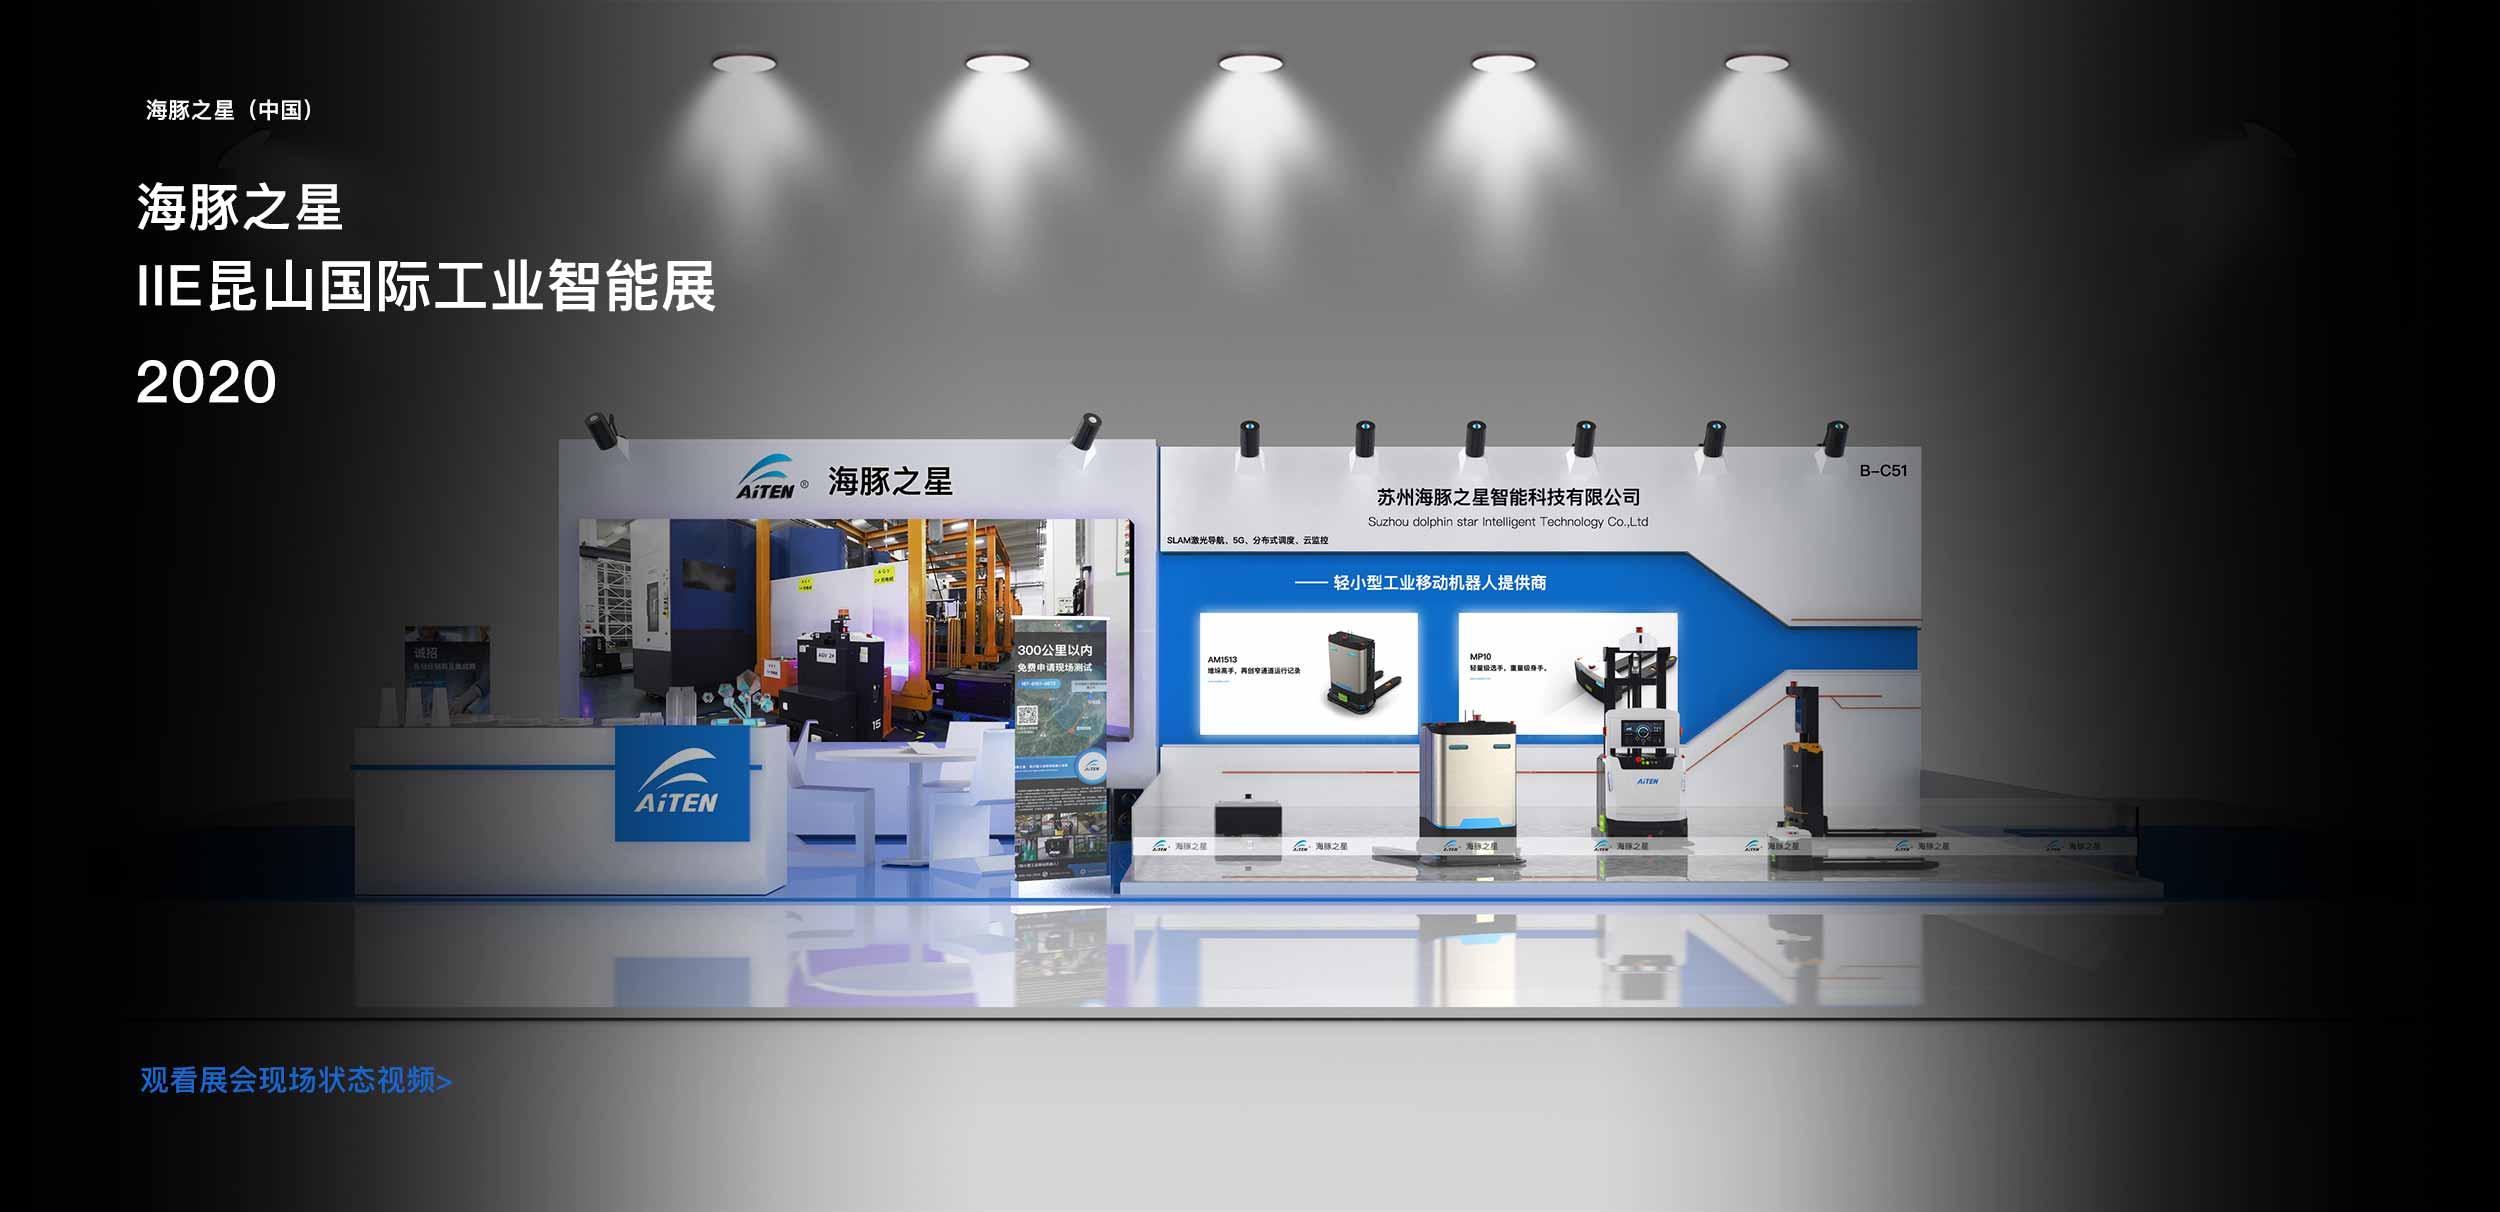 IIE昆山全球工业智能展